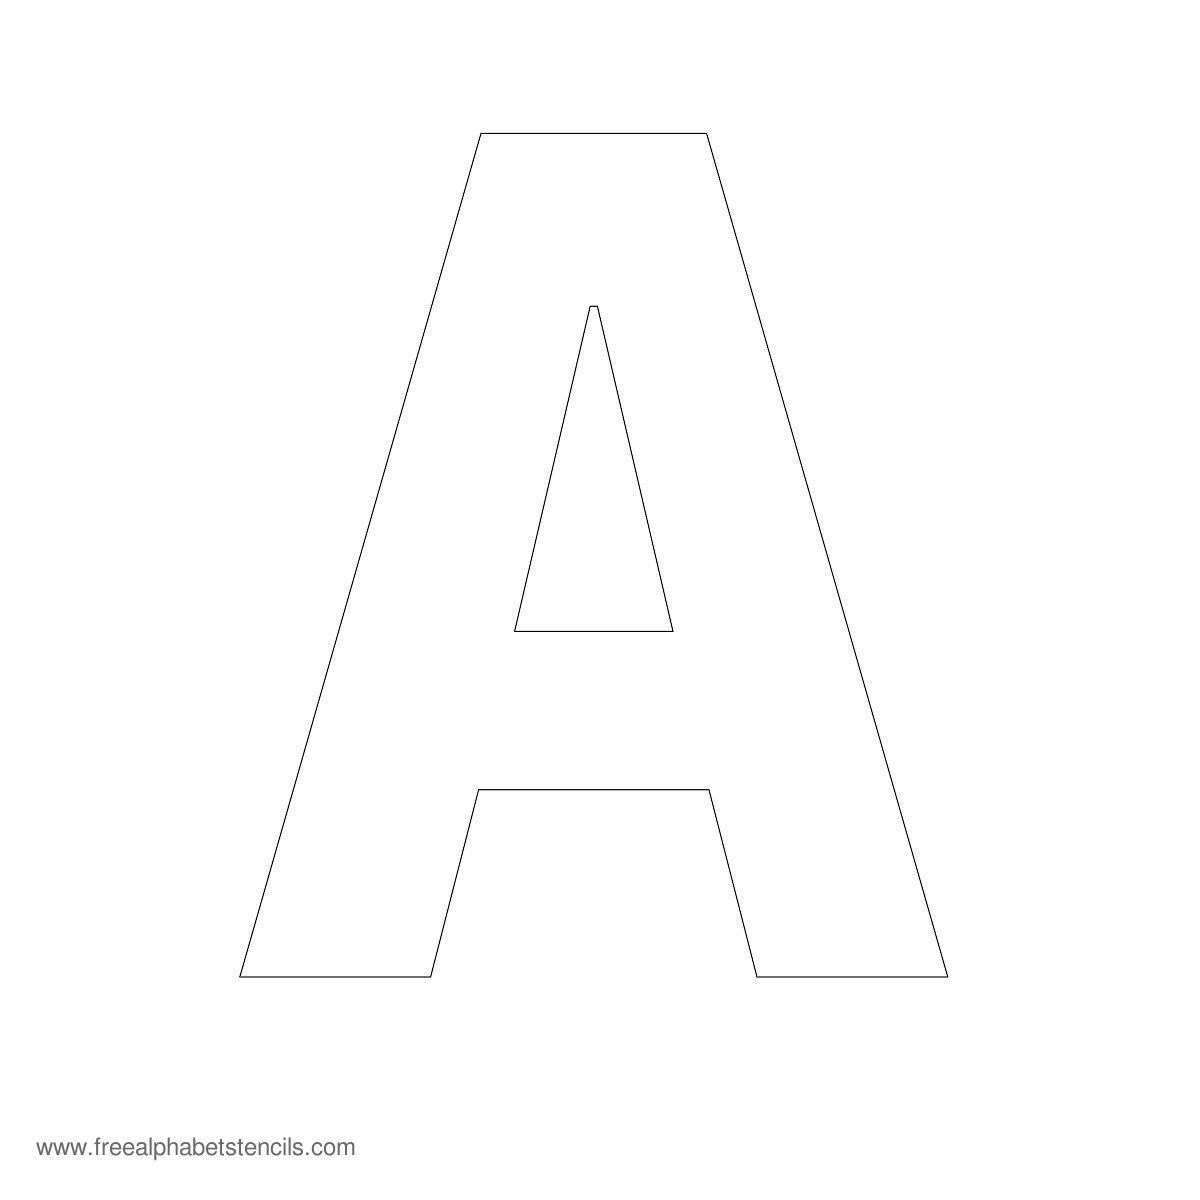 Large Alphabet Stencils | Freealphabetstencils - Free Printable Alphabet Stencils